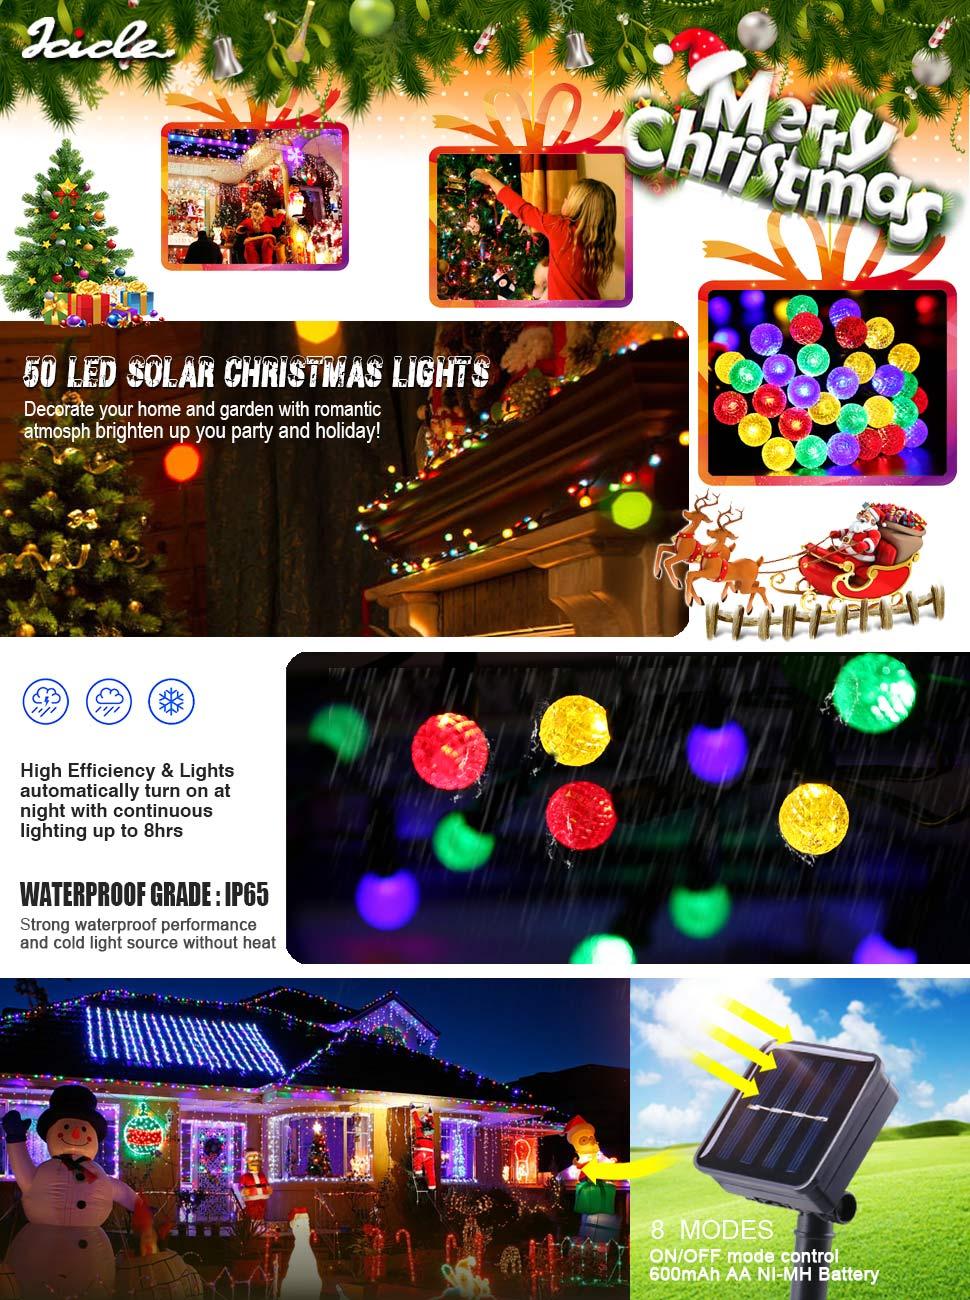 Amazon.com : Icicle Solar String Lights, 16.4FT 50 LED G14 Fairy ...